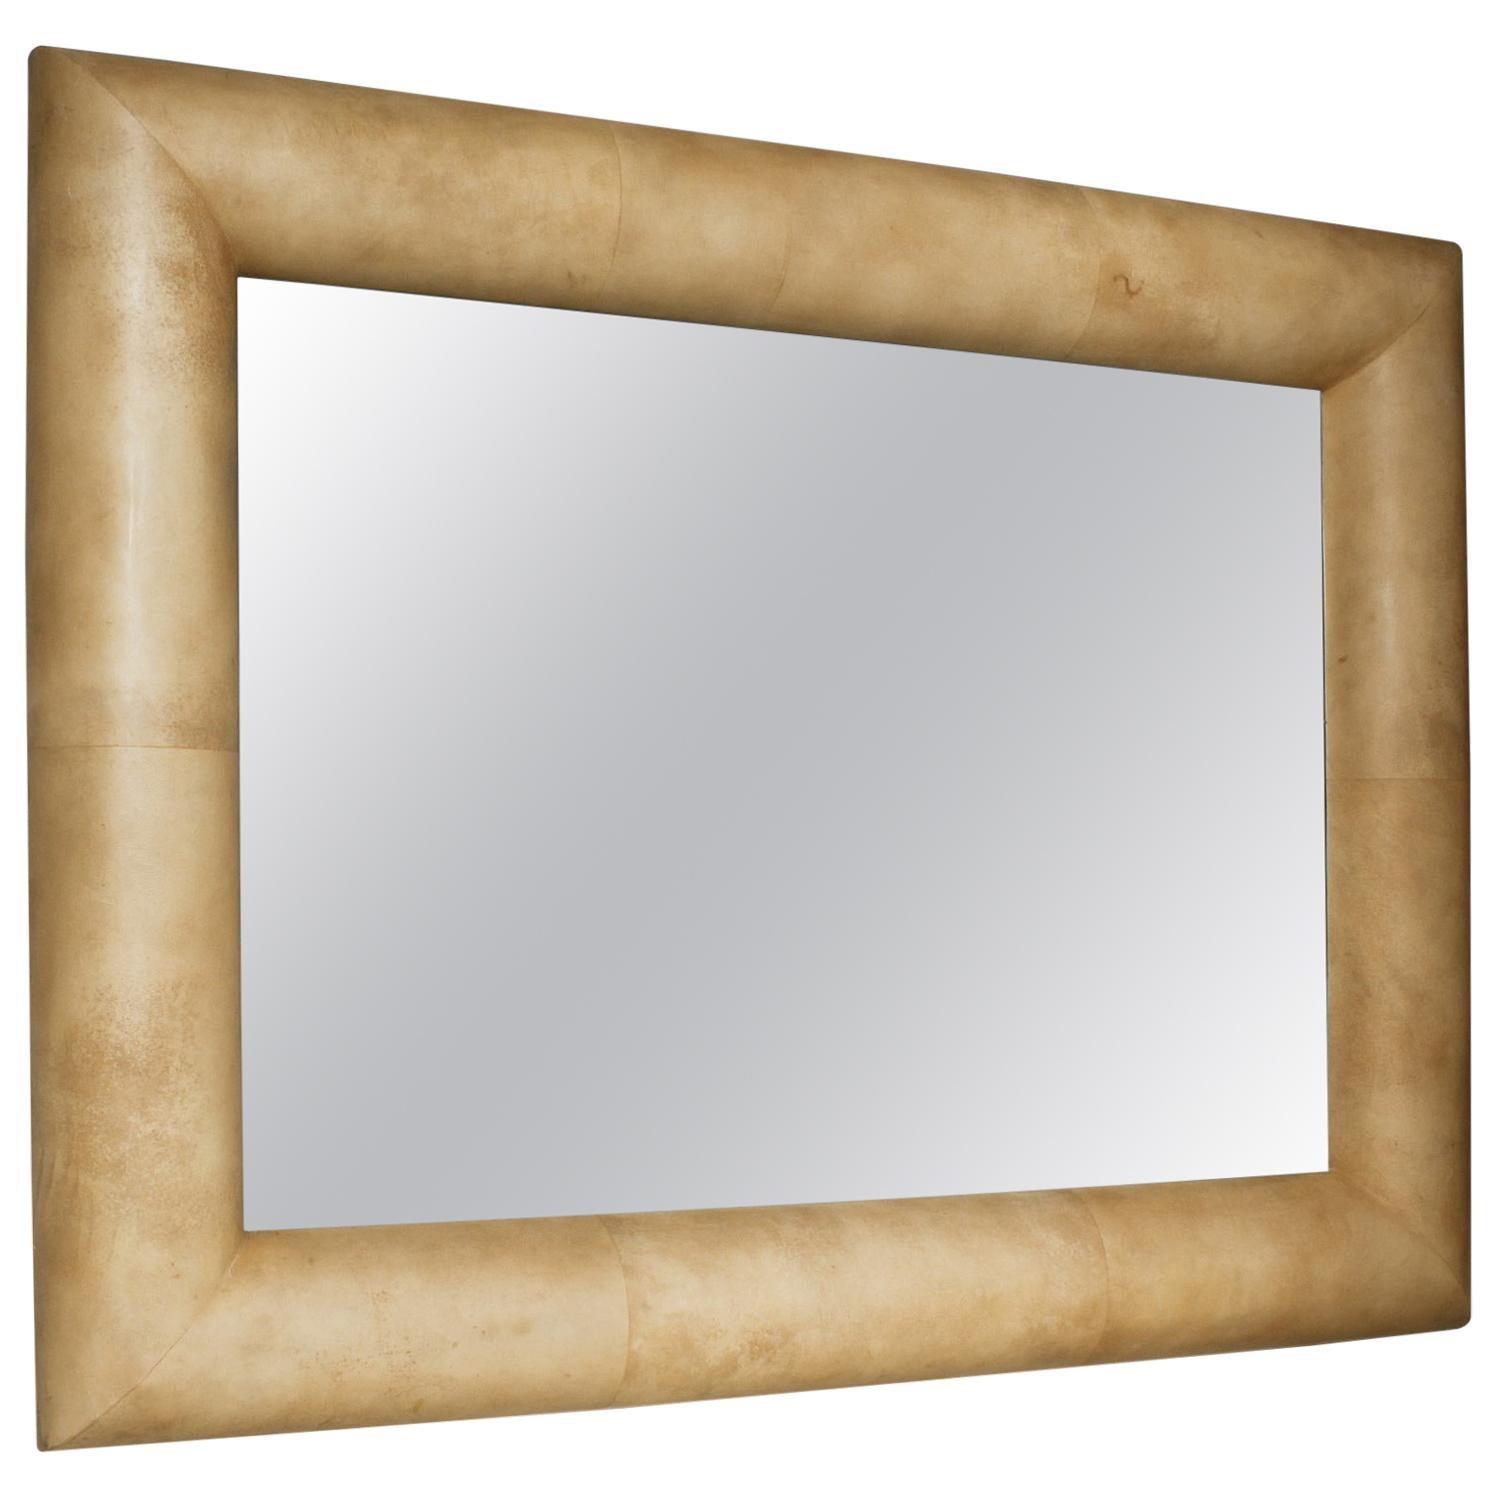 Large 1970s Half Round Goatskin Mirror in the Manner of Karl Springer